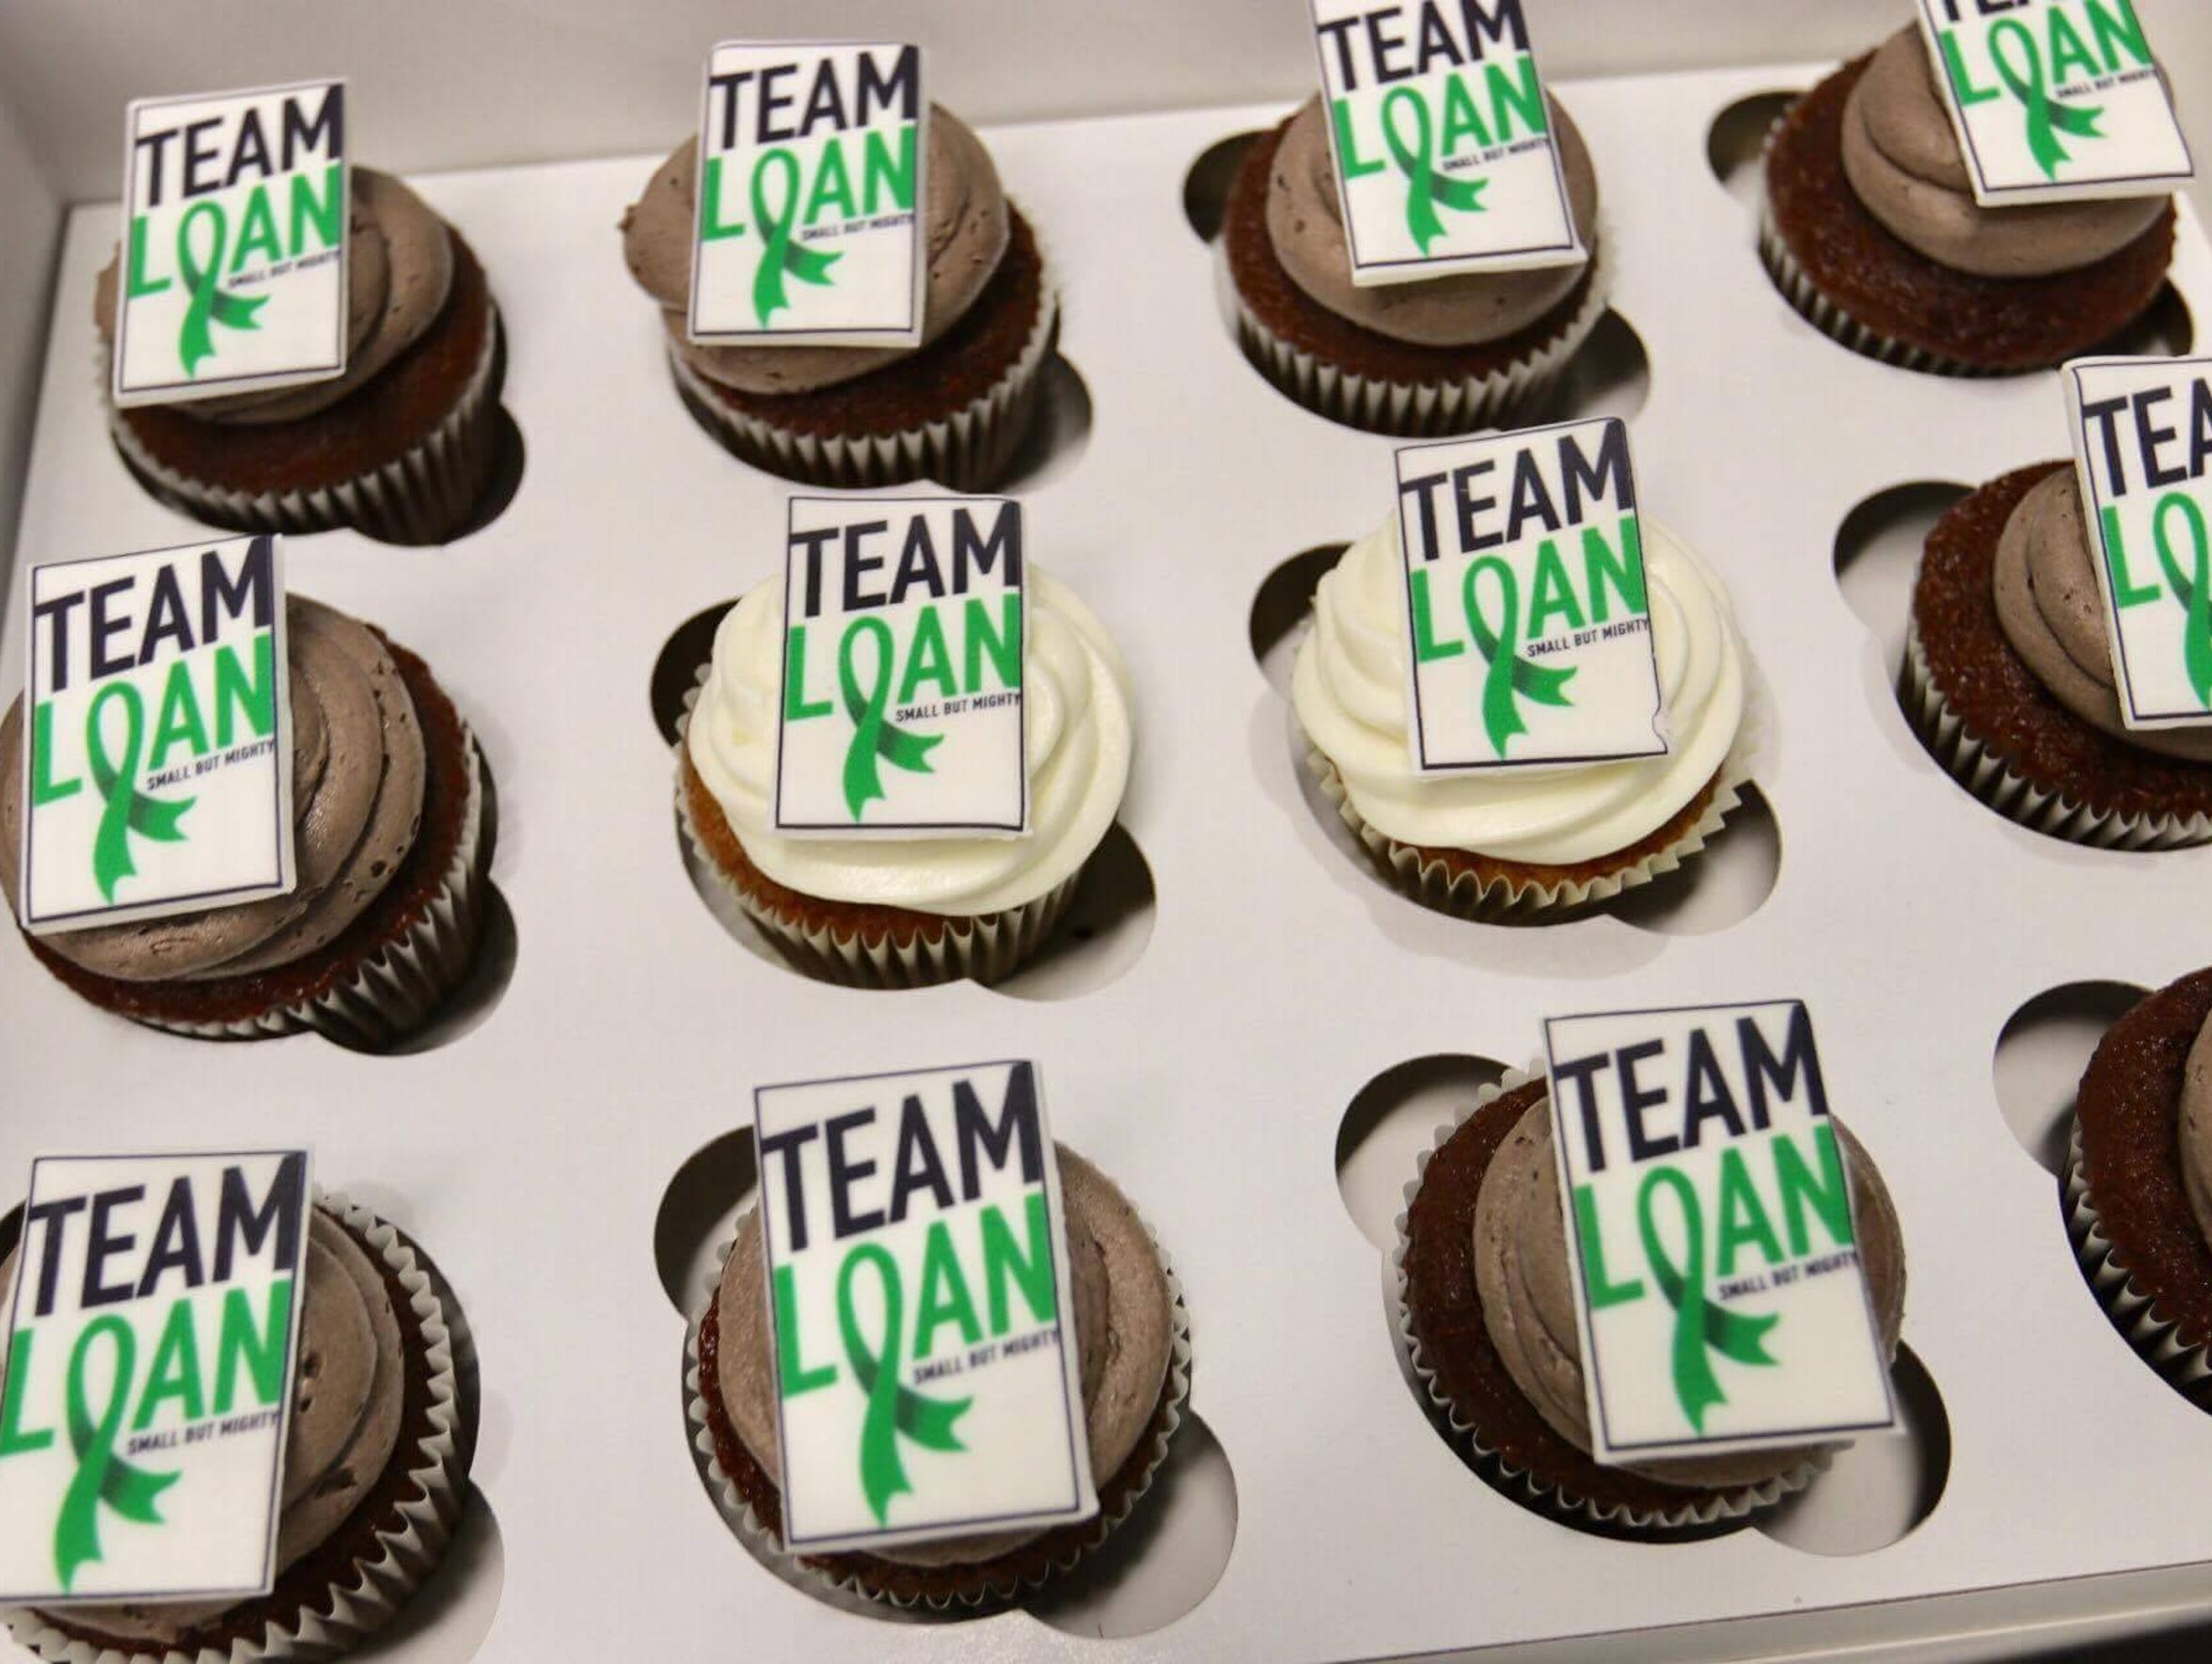 """Team Loan"" has grown tremendously."